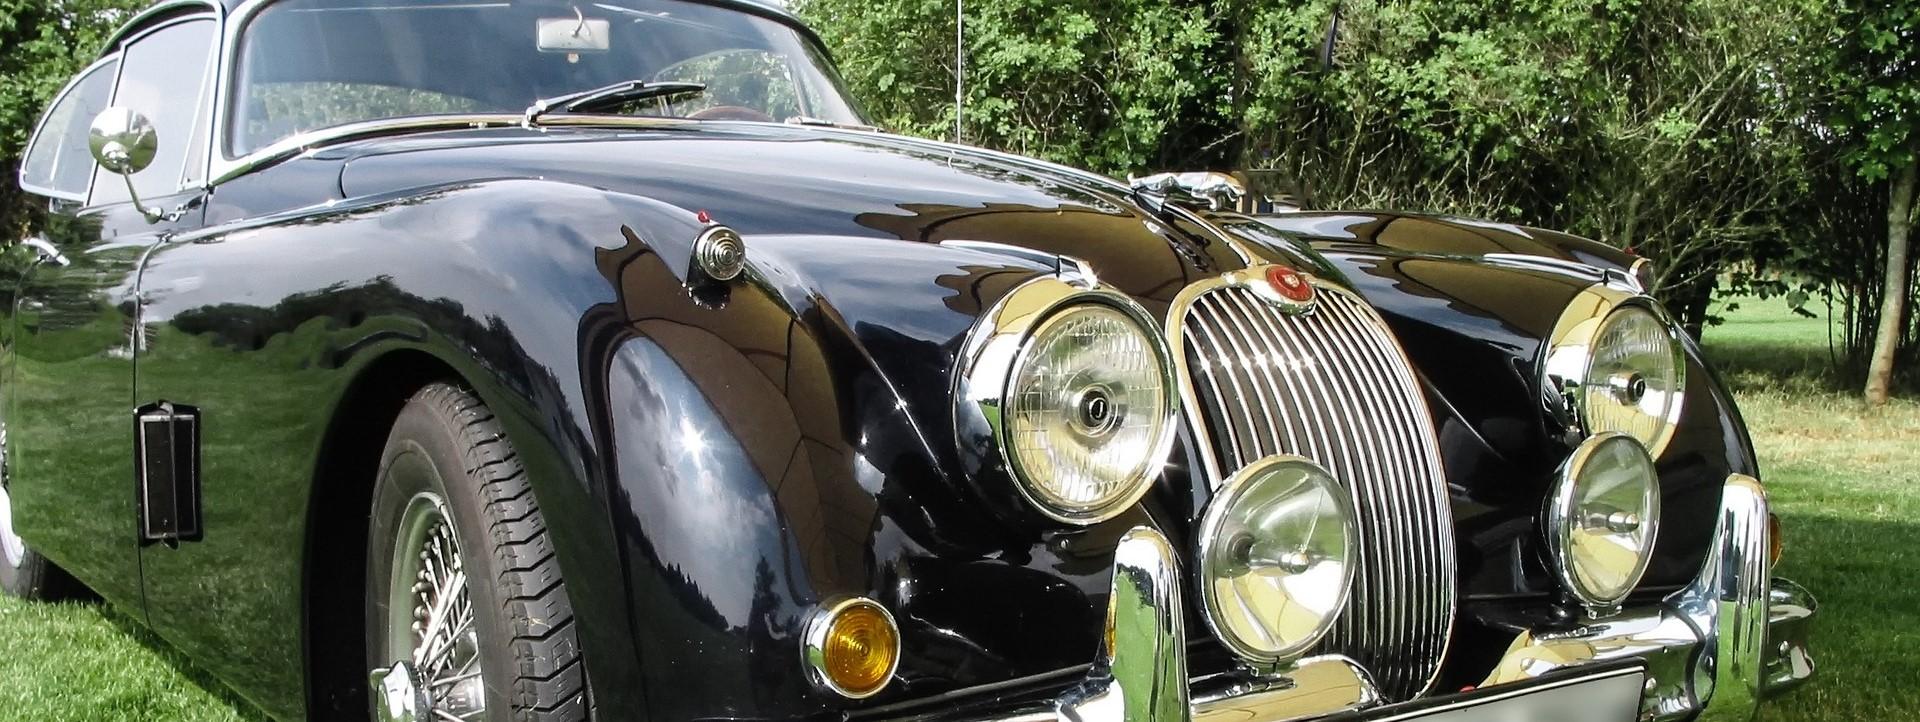 Vintage Jaguar in Jamestown, New York | Breast Cancer Car Donations